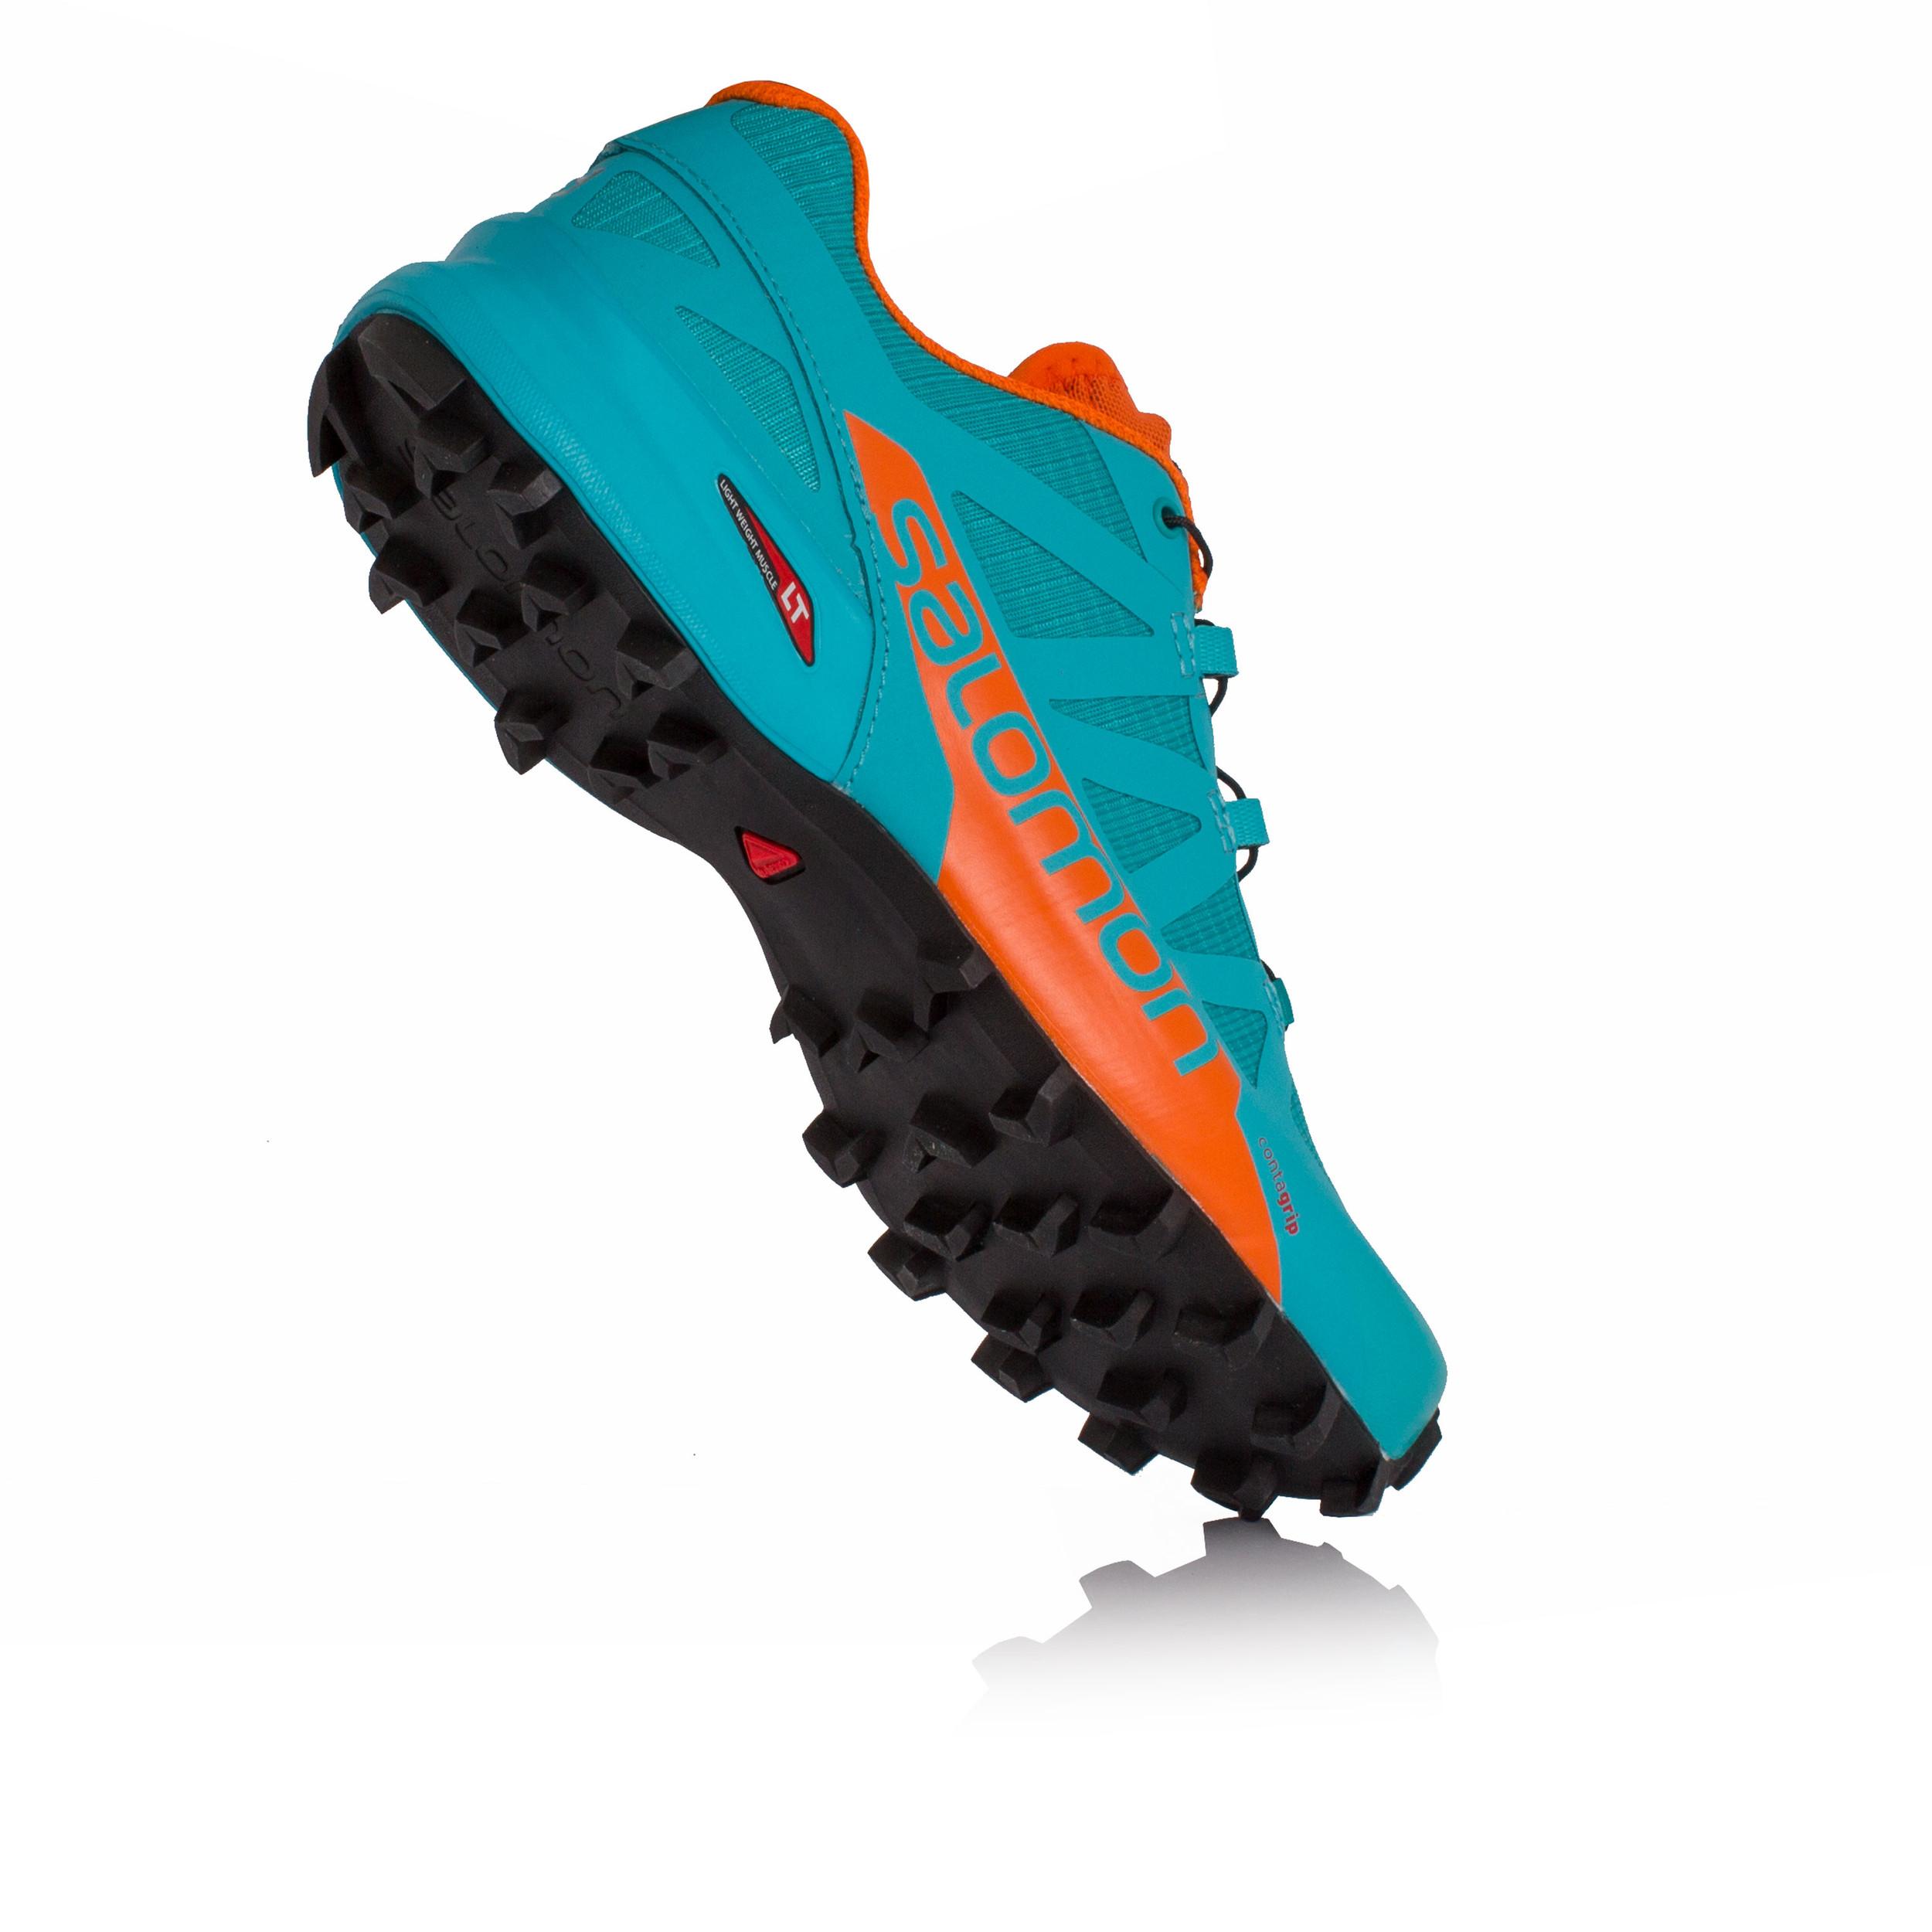 4a326ff32993 Salomon Speedcross Pro 2 Womens Orange Blue Running Sports Shoes Trainers